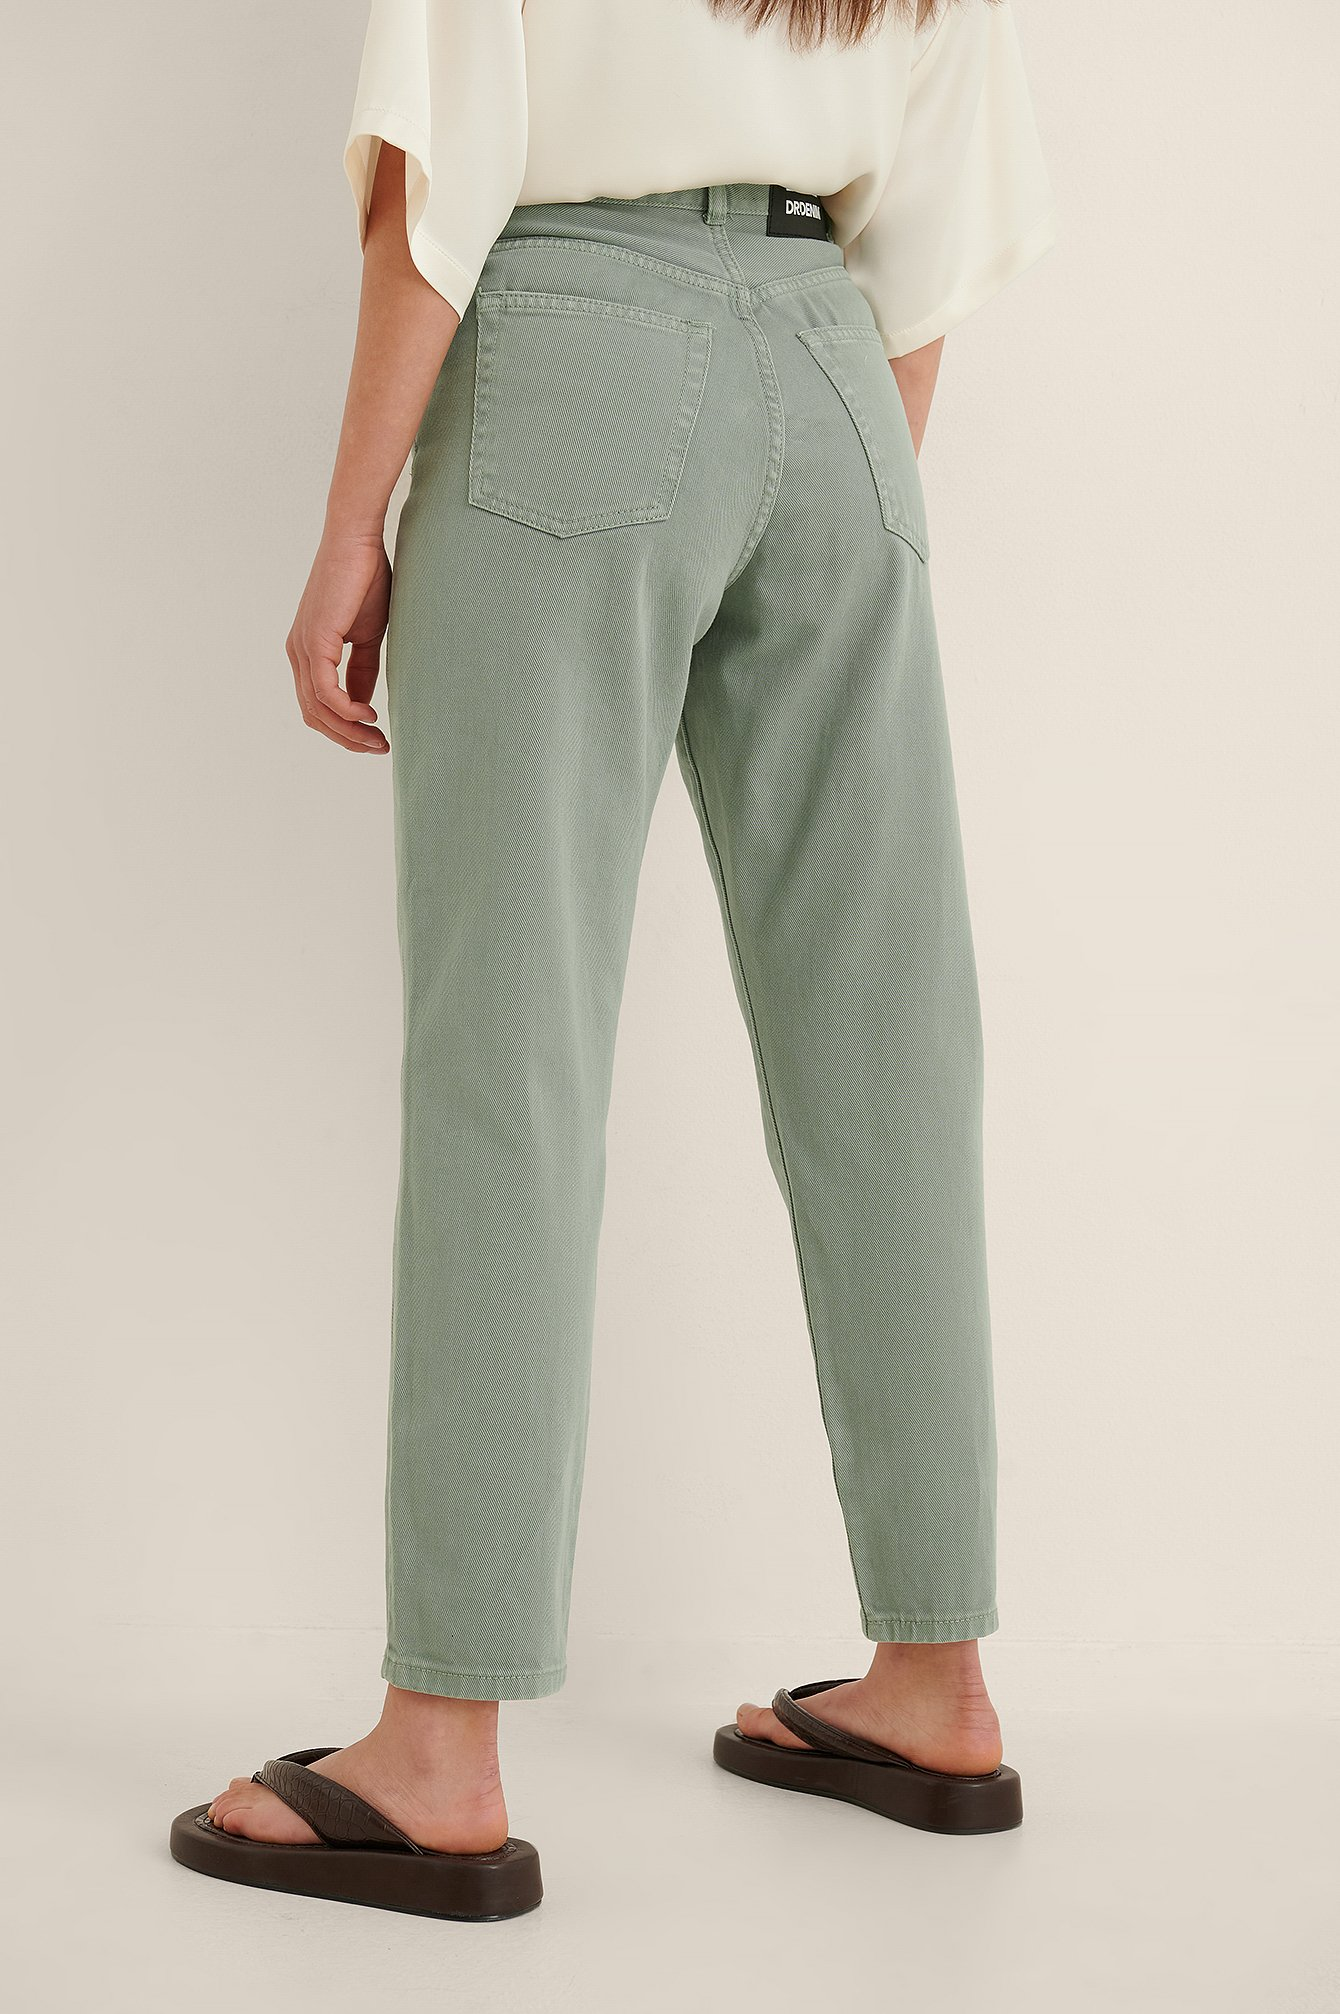 Dr Denim Mom Jeans - Green